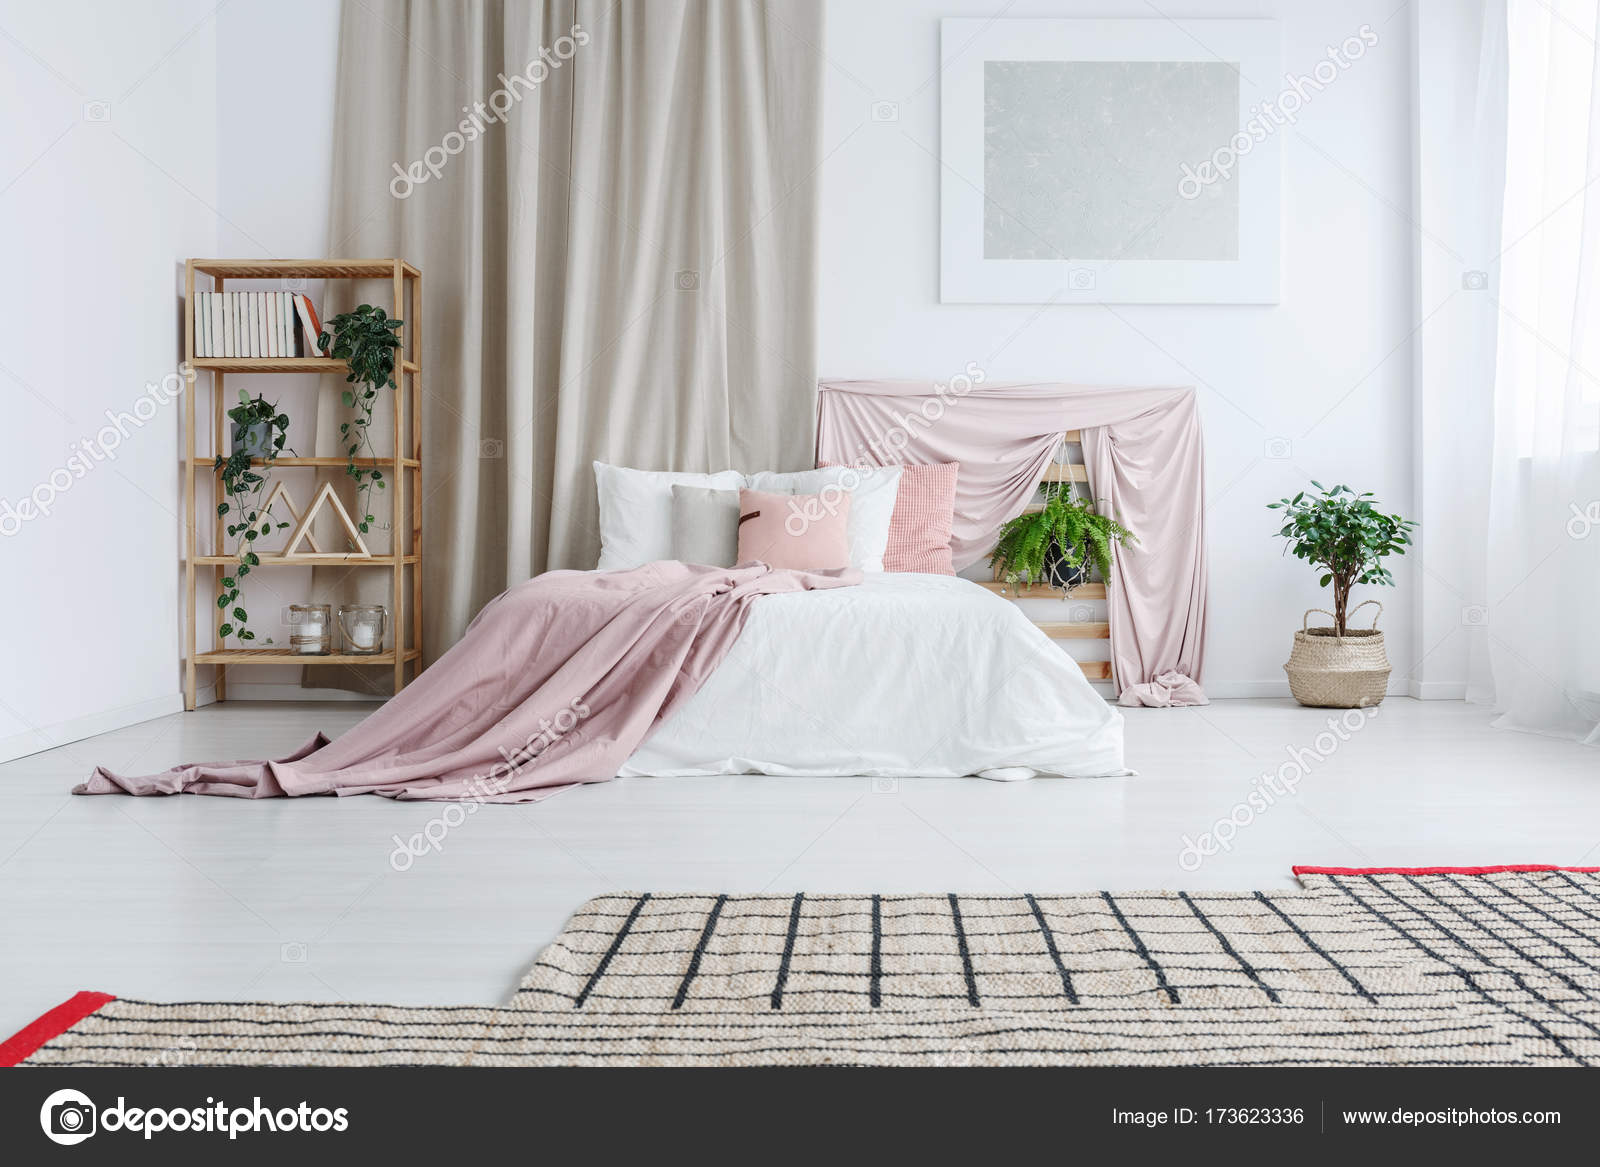 Kingsize Bett In Pastell Schlafzimmer U2014 Stockfoto